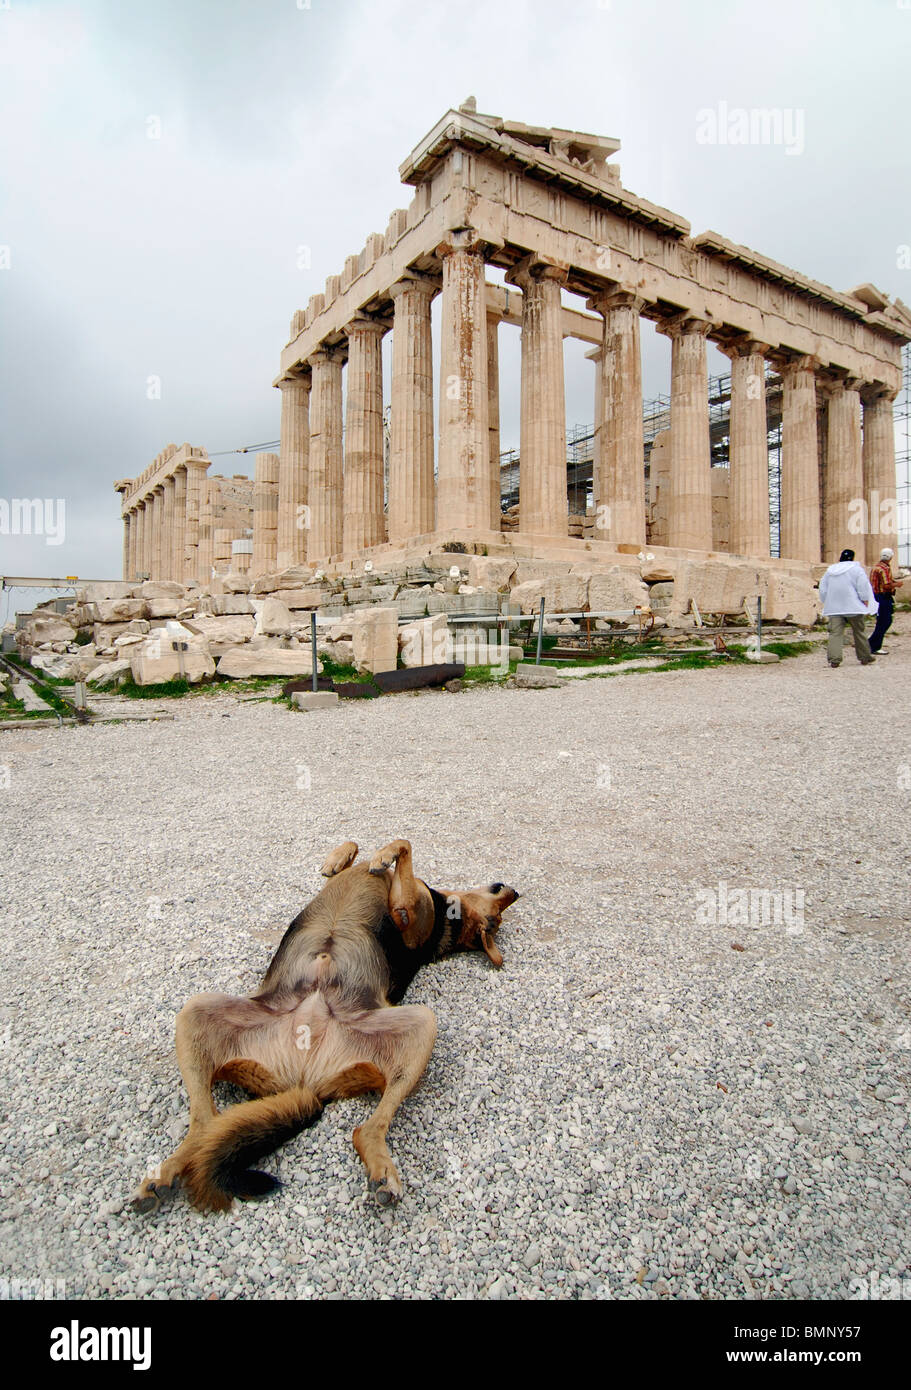 Stray dog enjoying itself in front of Acropolis, Athens, Greece - Stock Image